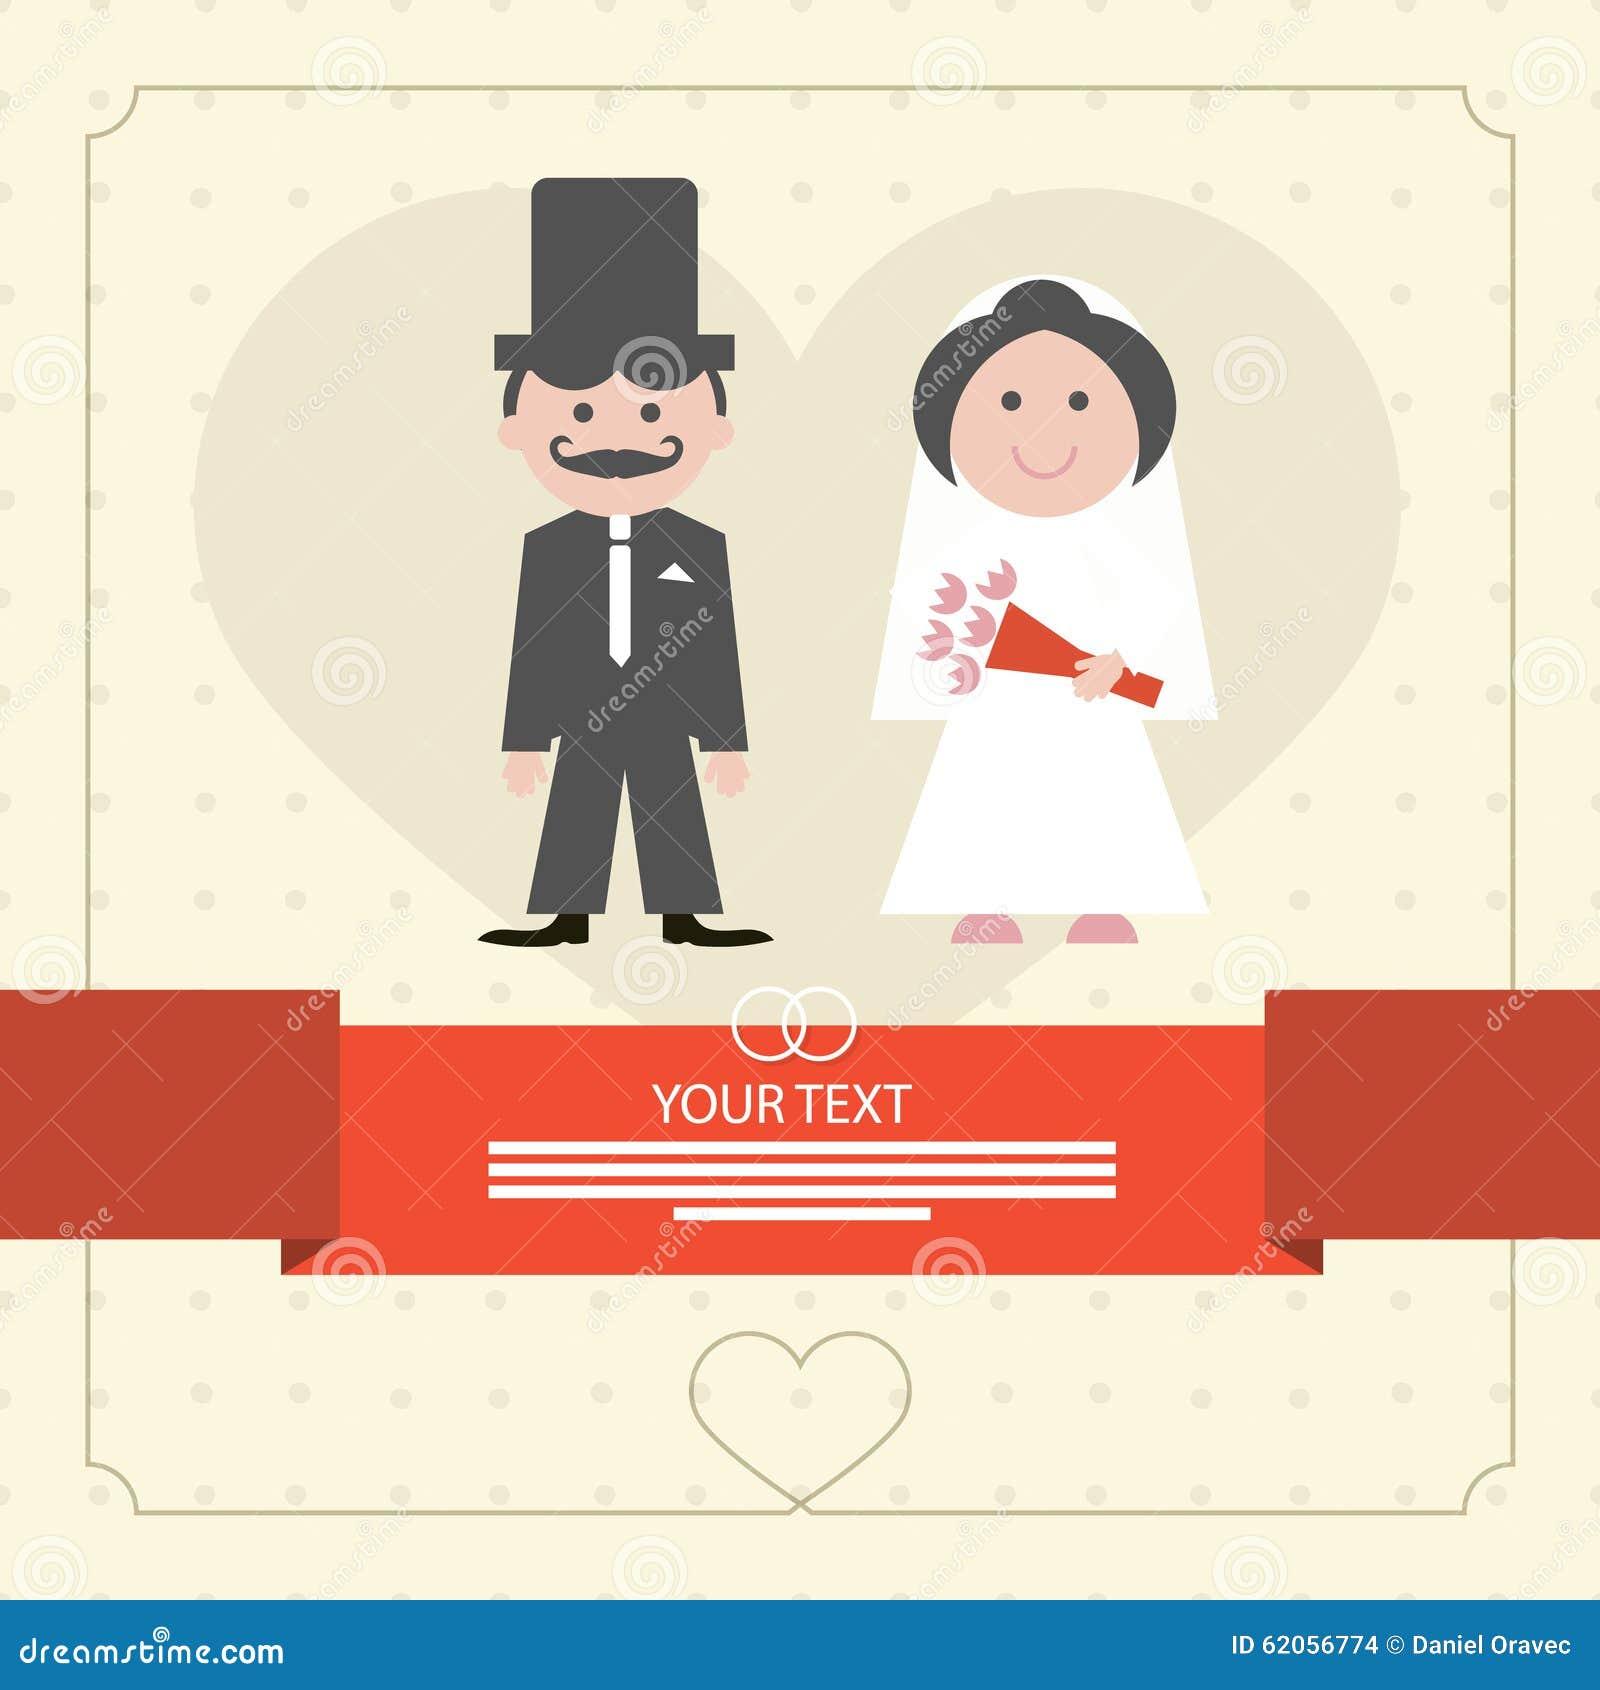 Retro Flat Design Wedding Card Illustration Stock Vector ...